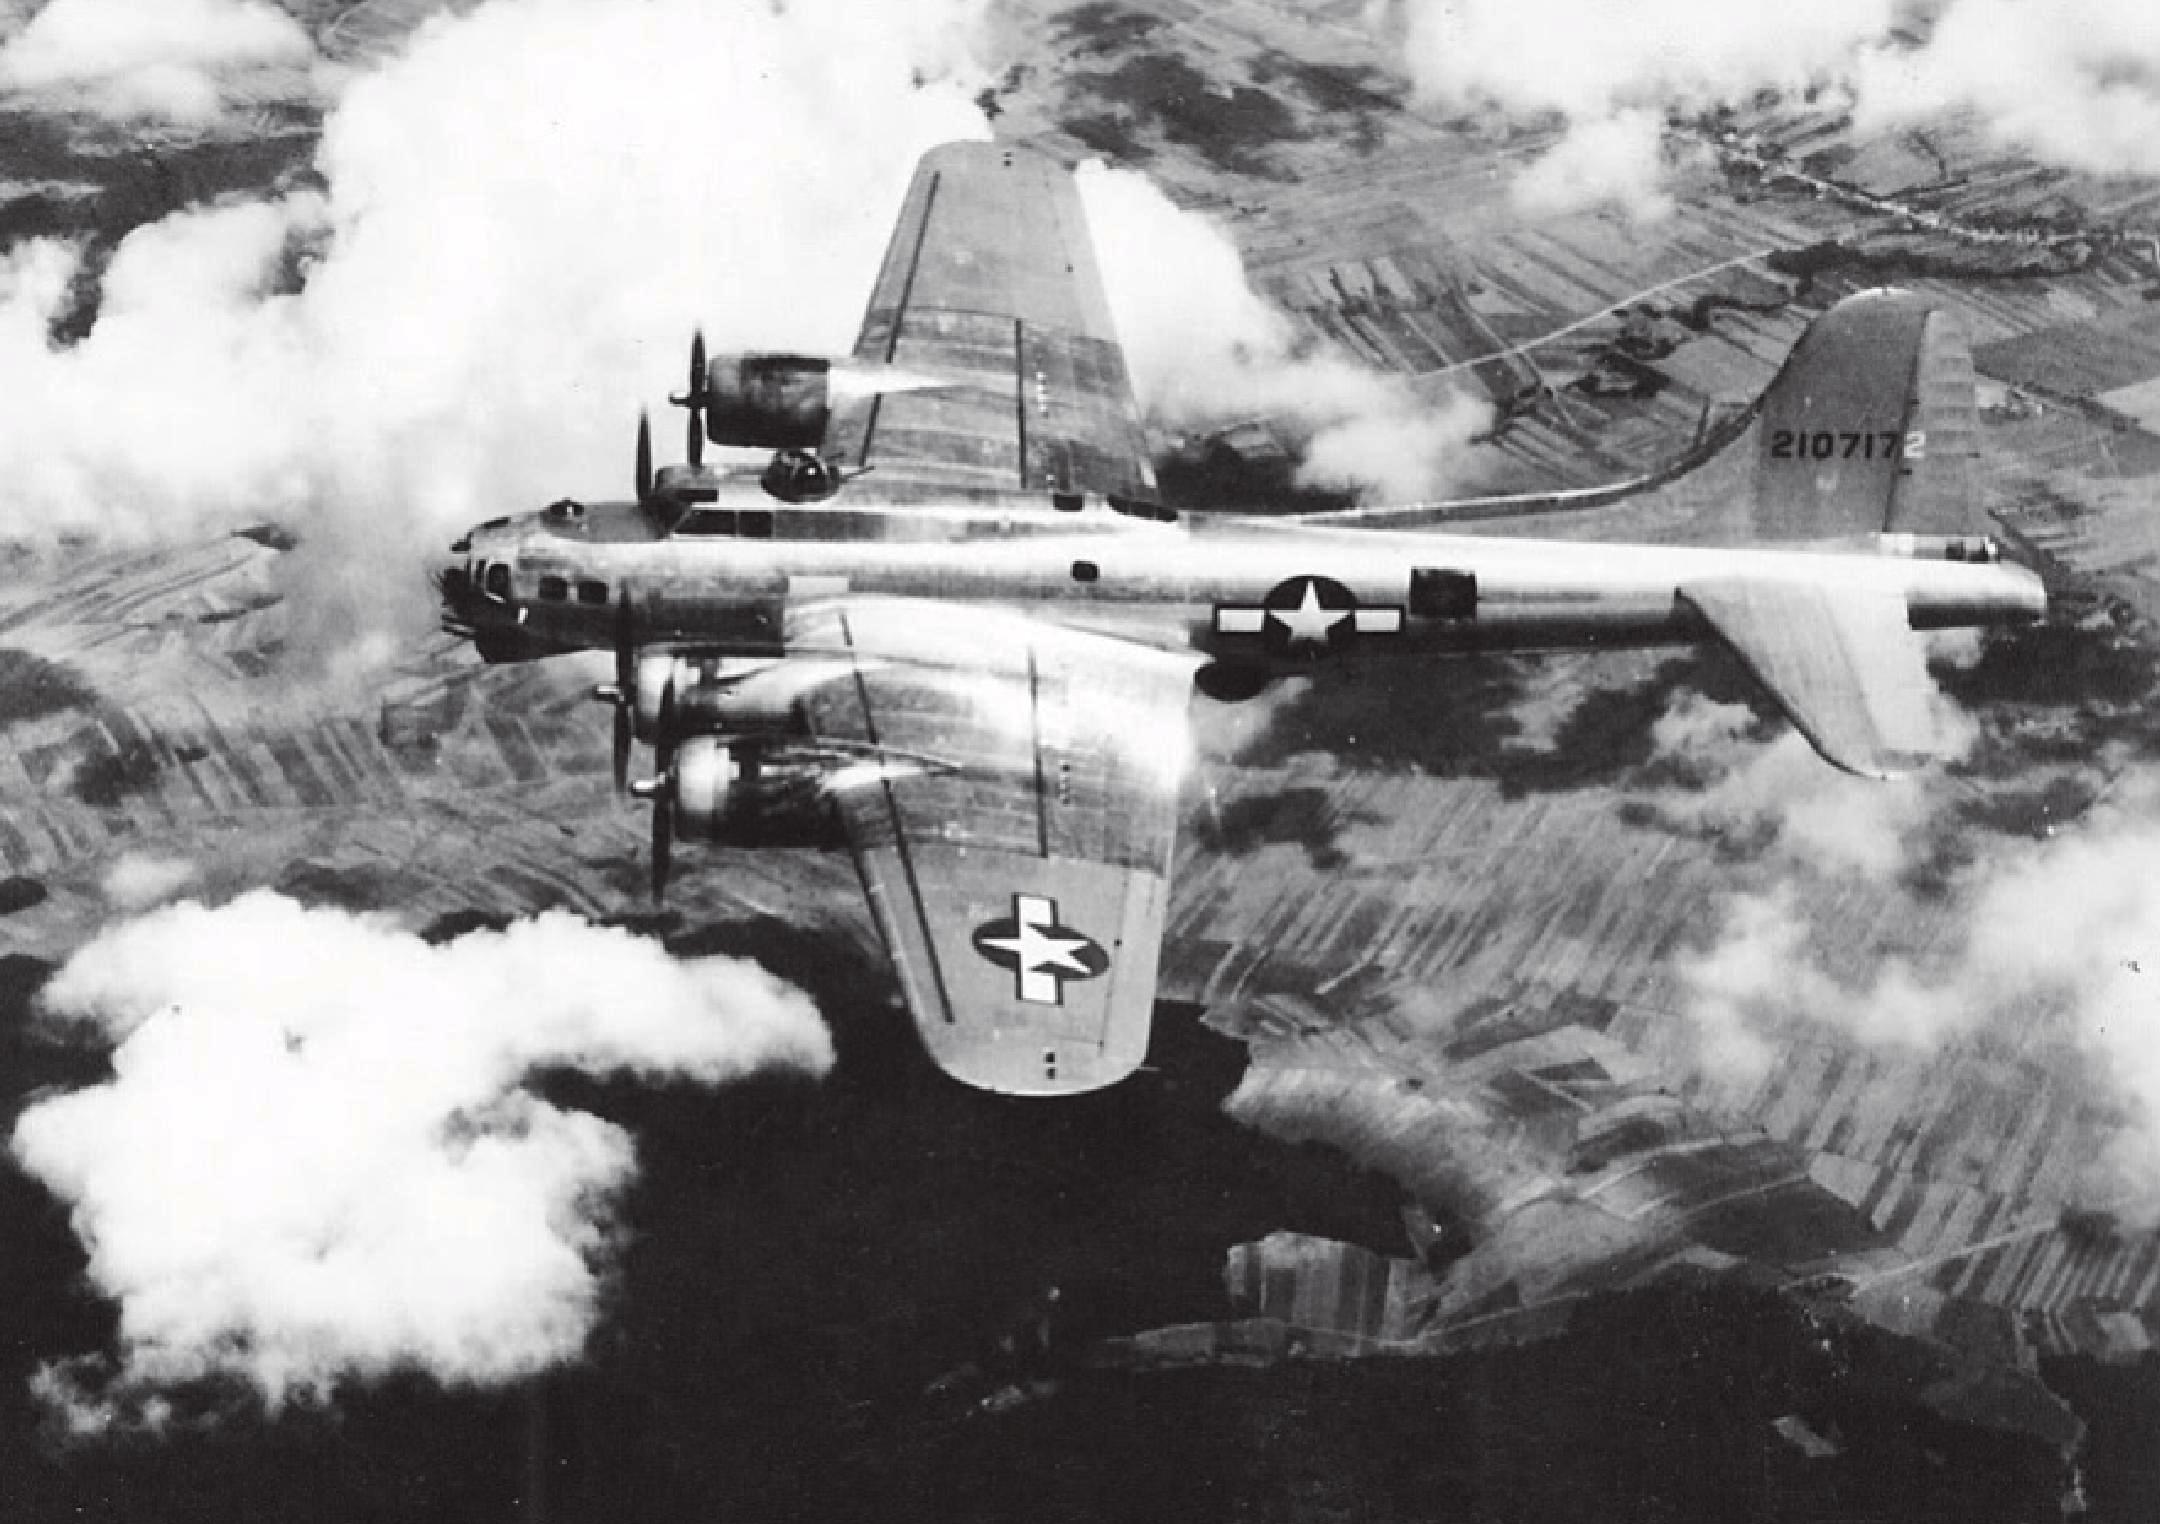 B-17 #42-107172